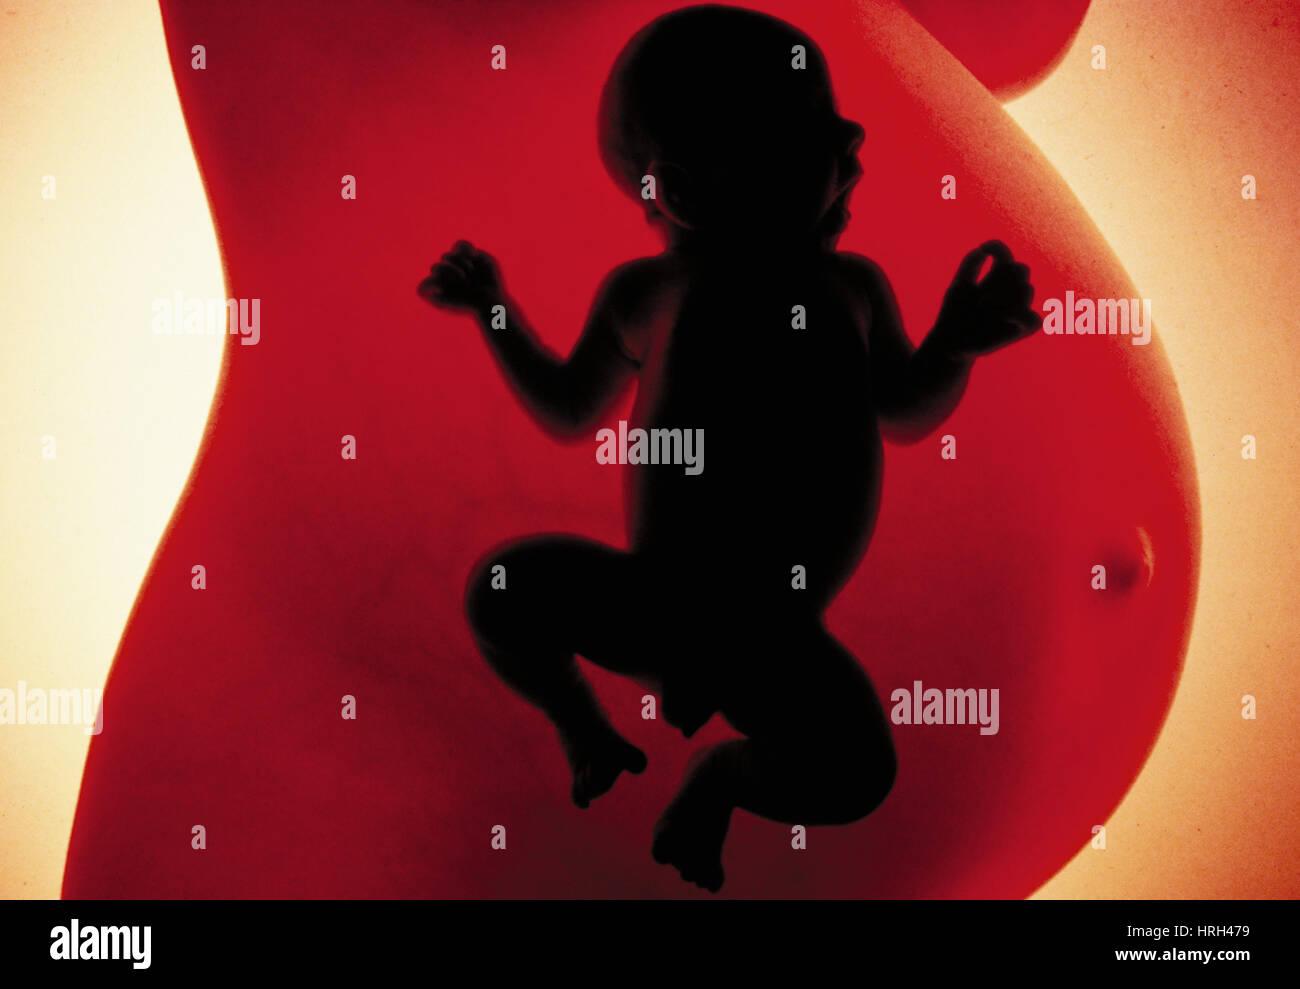 Human reproduction - Stock Image